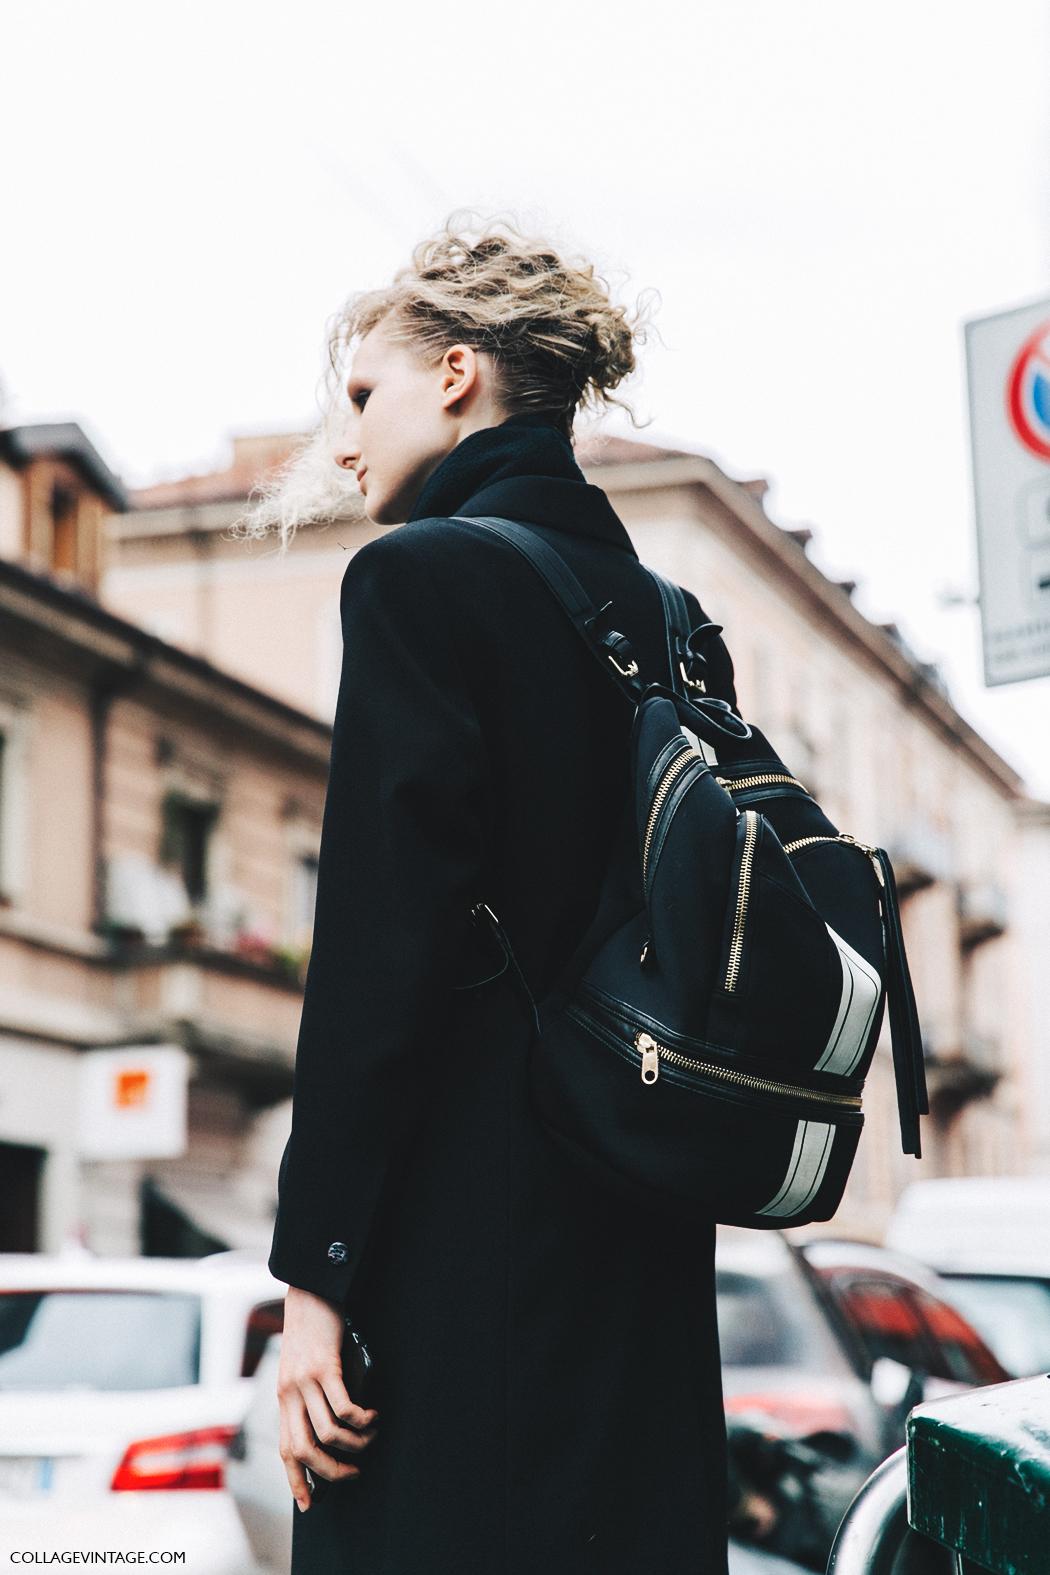 Milan_Fashion_Week_Fall_16-MFW-Street_Style-Collage_Vintage-Armani-Model-Backpack-